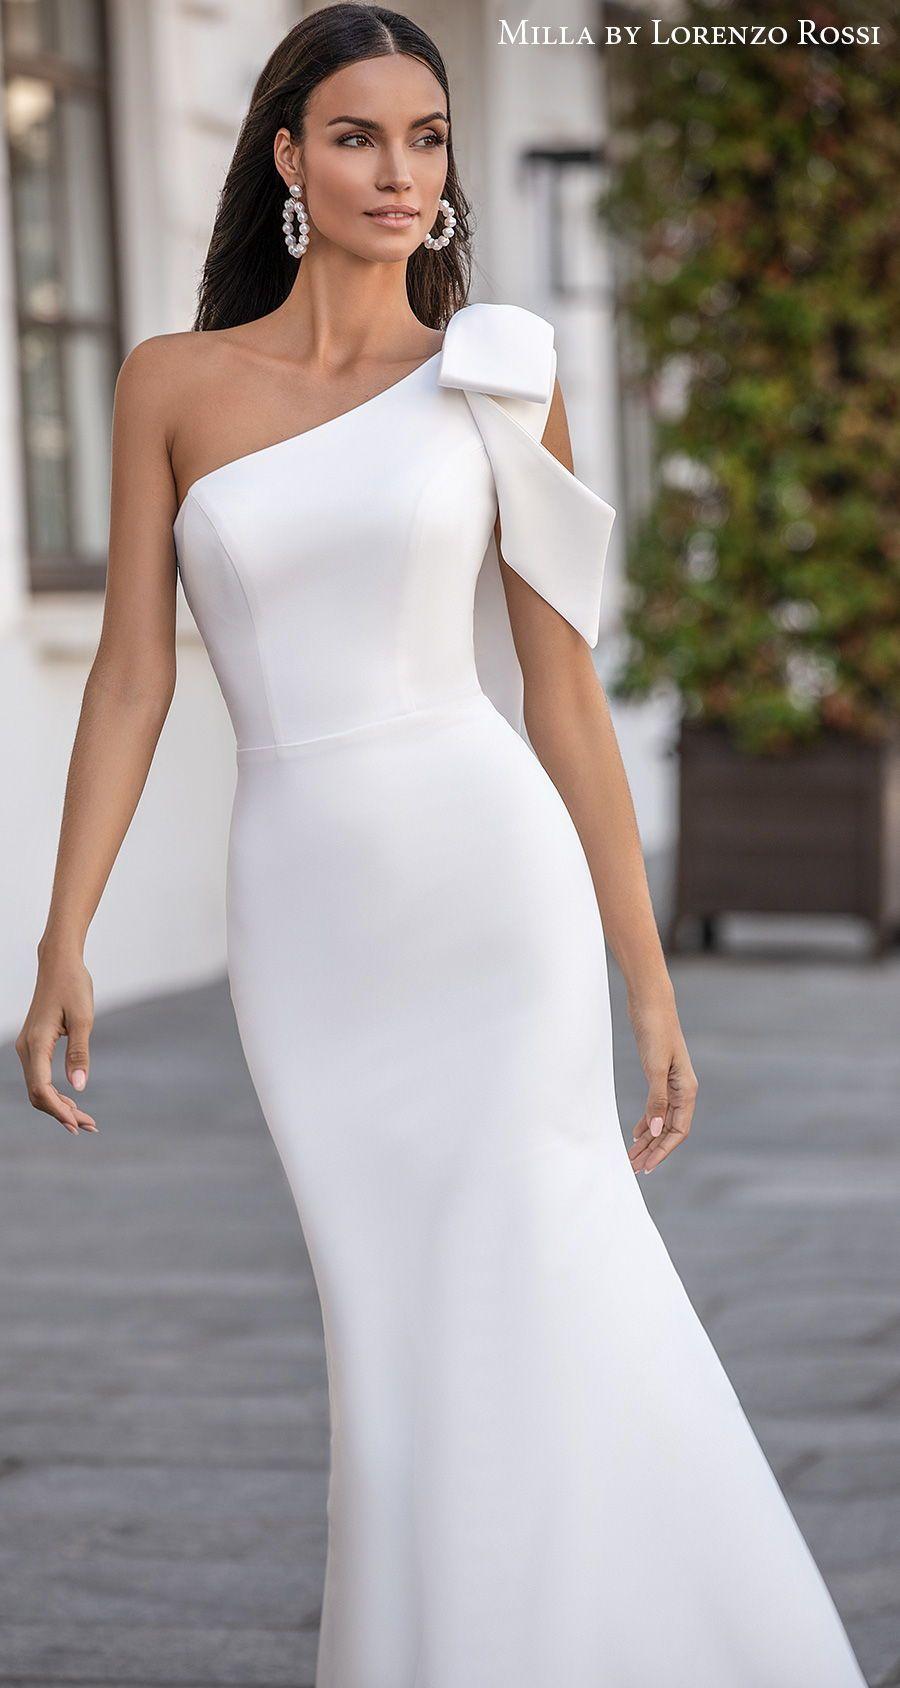 Simple Chic Wedding Dress Wedding Dresses Chic Wedding Dresses Dream Wedding Dresses [ 1200 x 972 Pixel ]